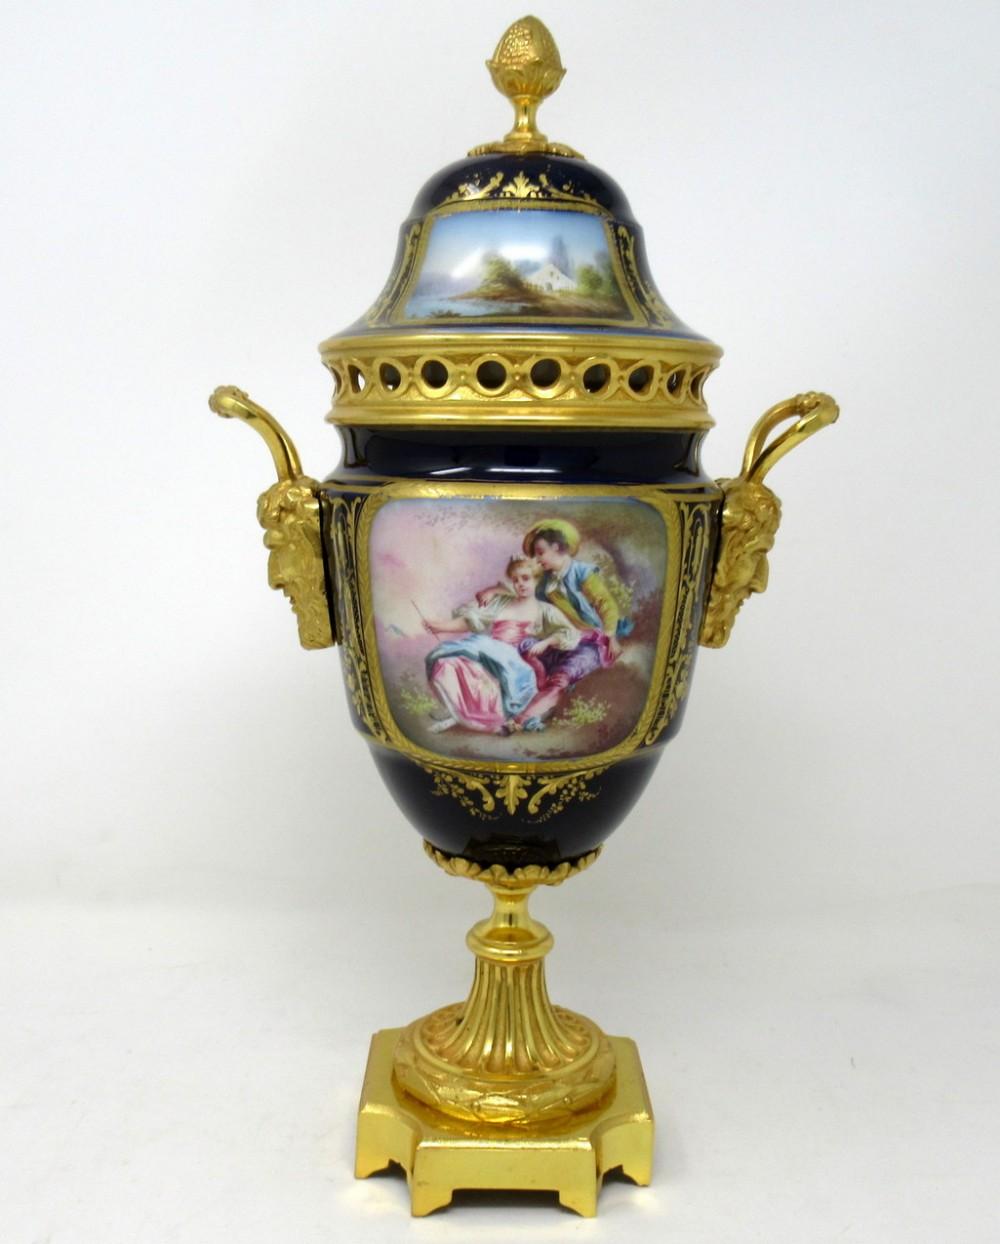 antique french sevres porcelain ormolu gilt bronze urn vase potpourri 19thct